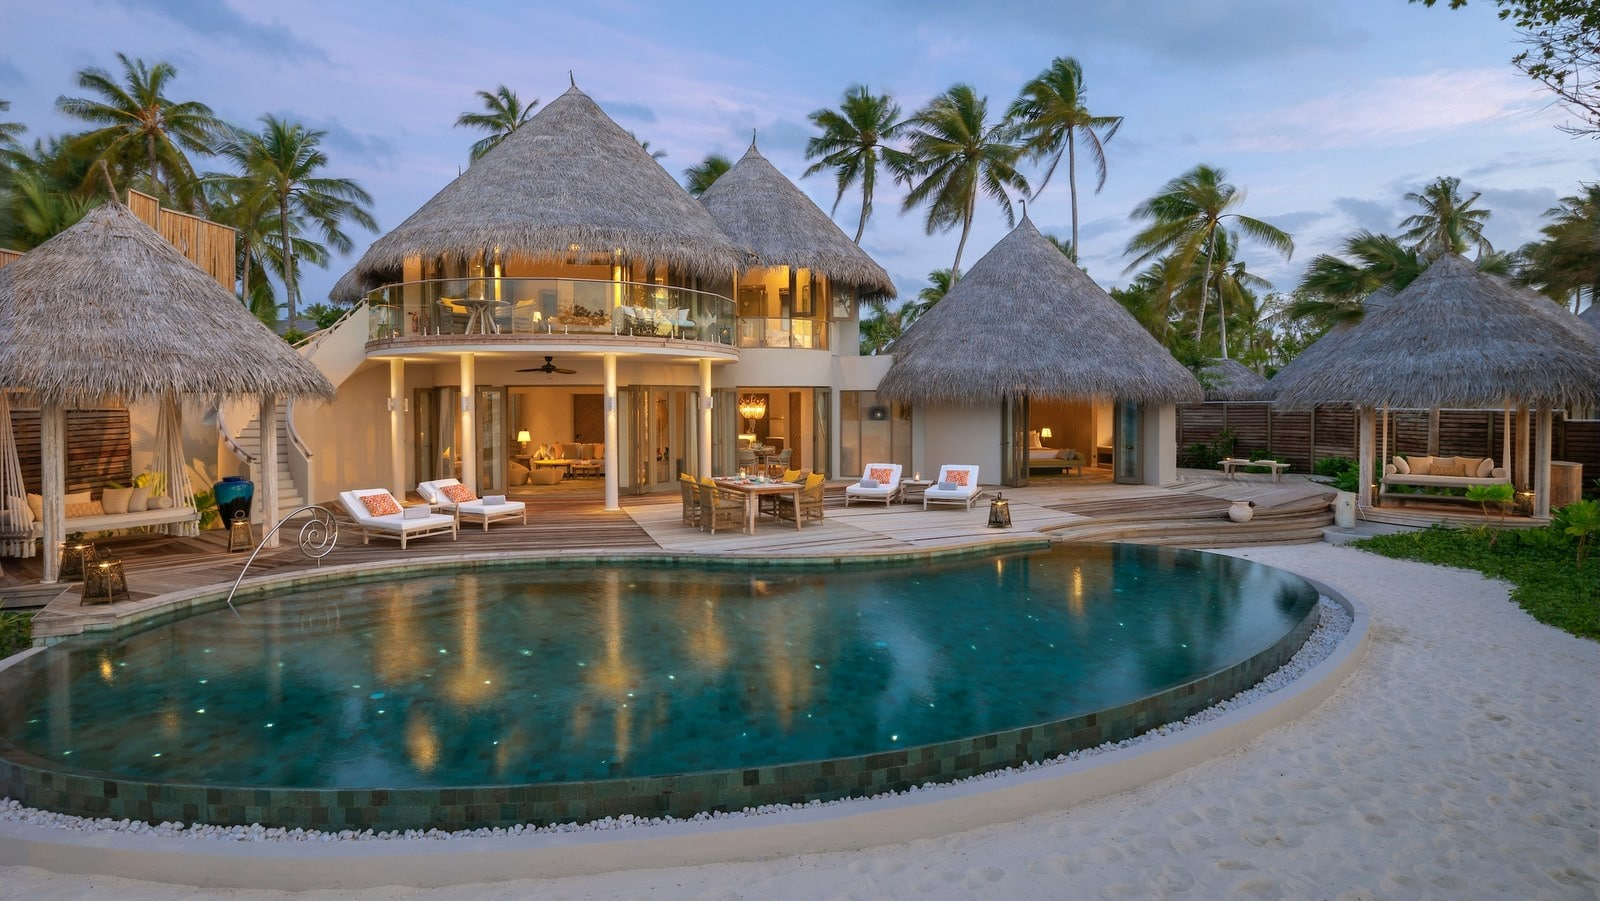 Мальдивы, отель The Nautilus Maldives, номер Two-Bedroom Beach Residence